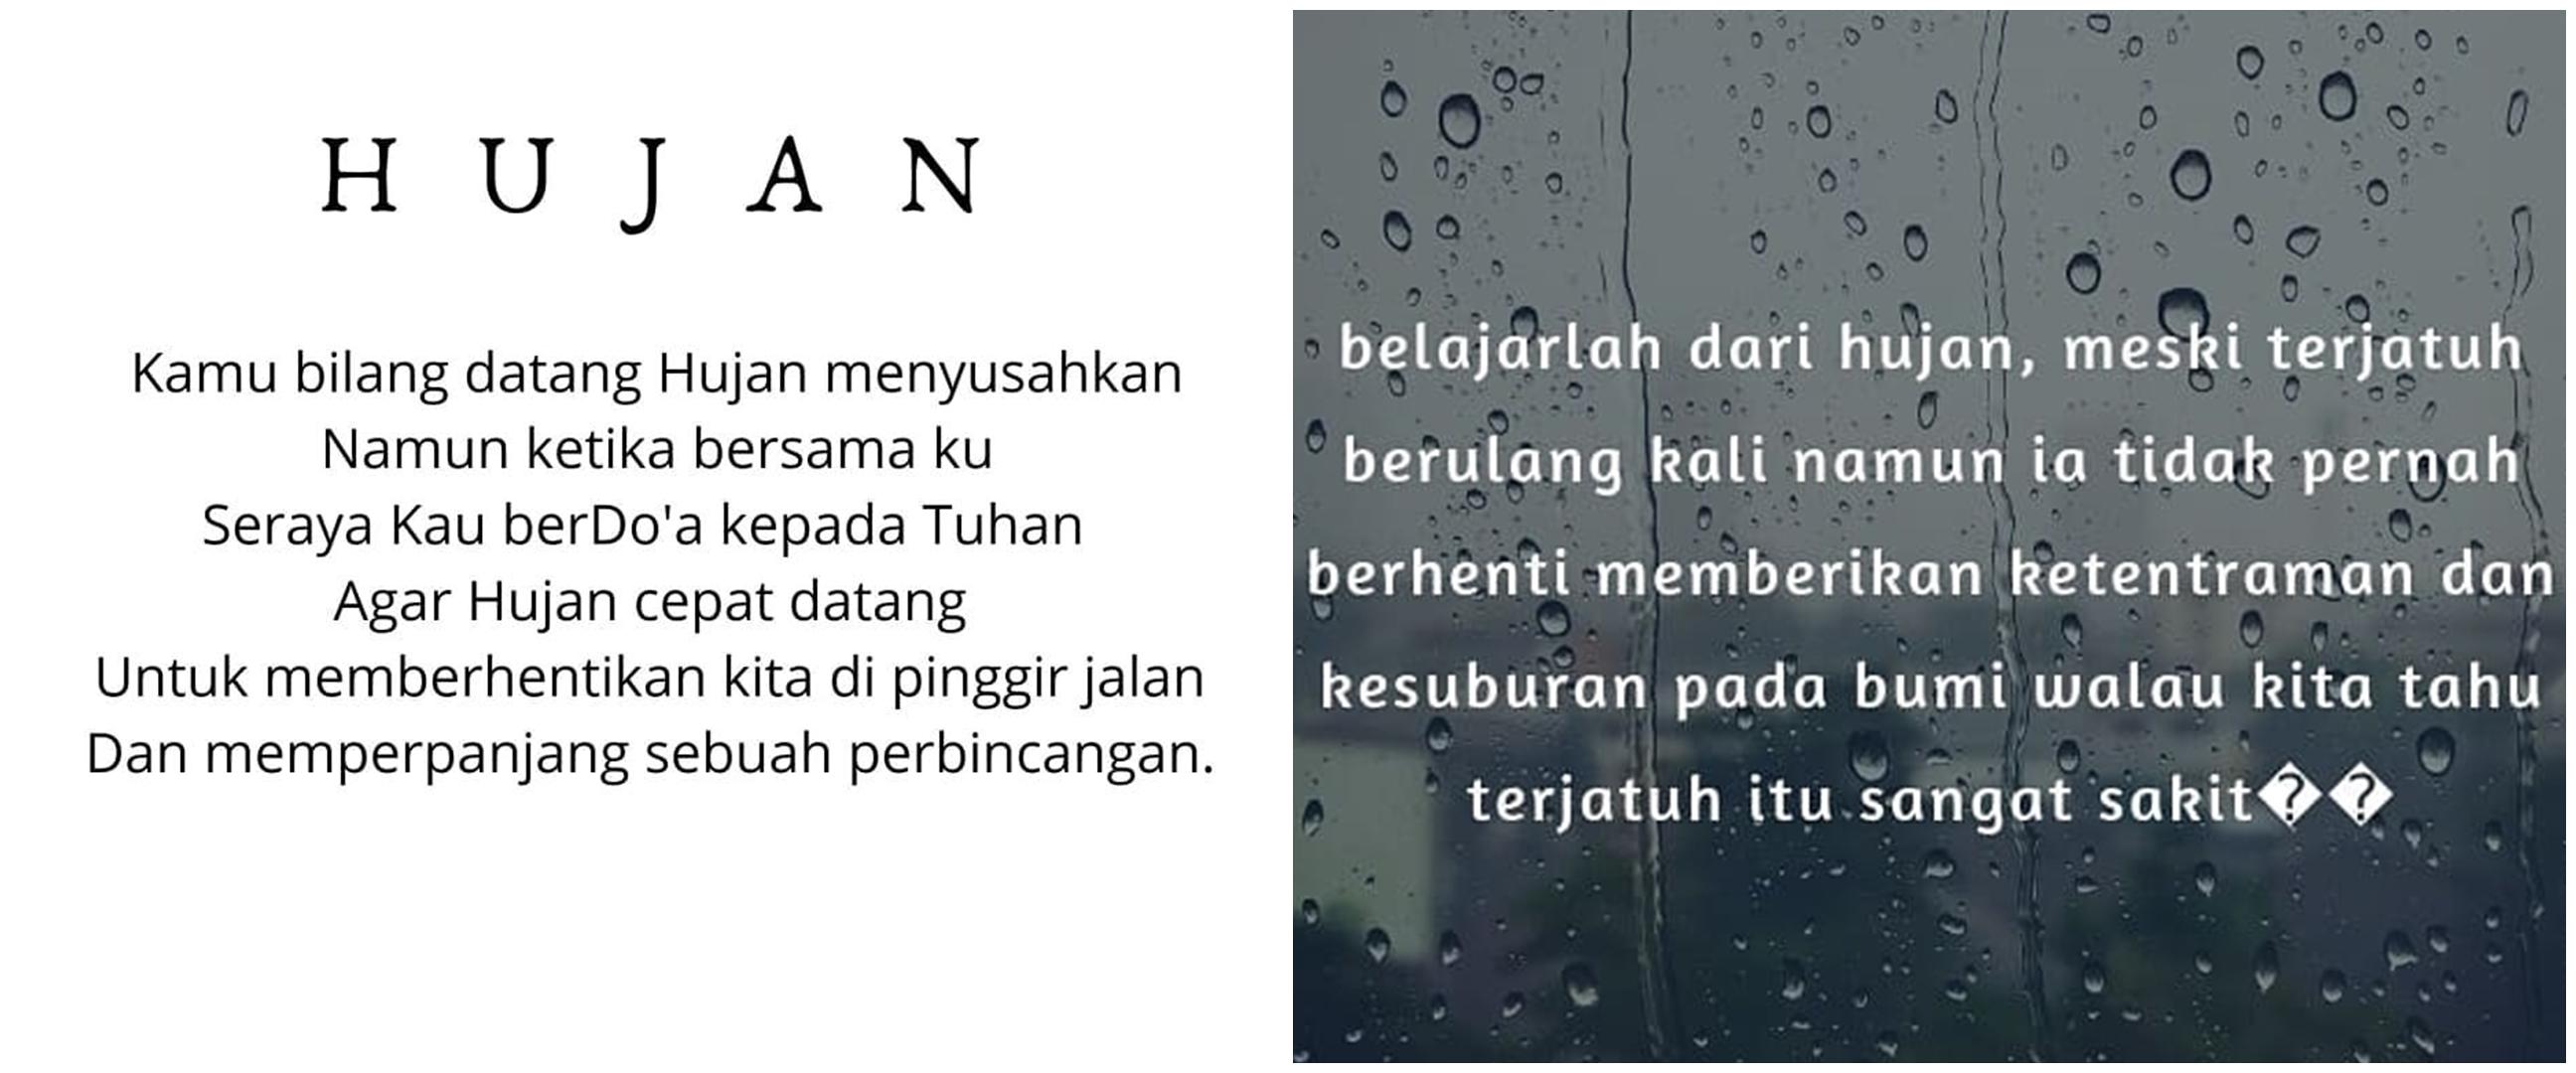 40 Kata-kata mutiara tentang hujan, puitis dan penuh makna